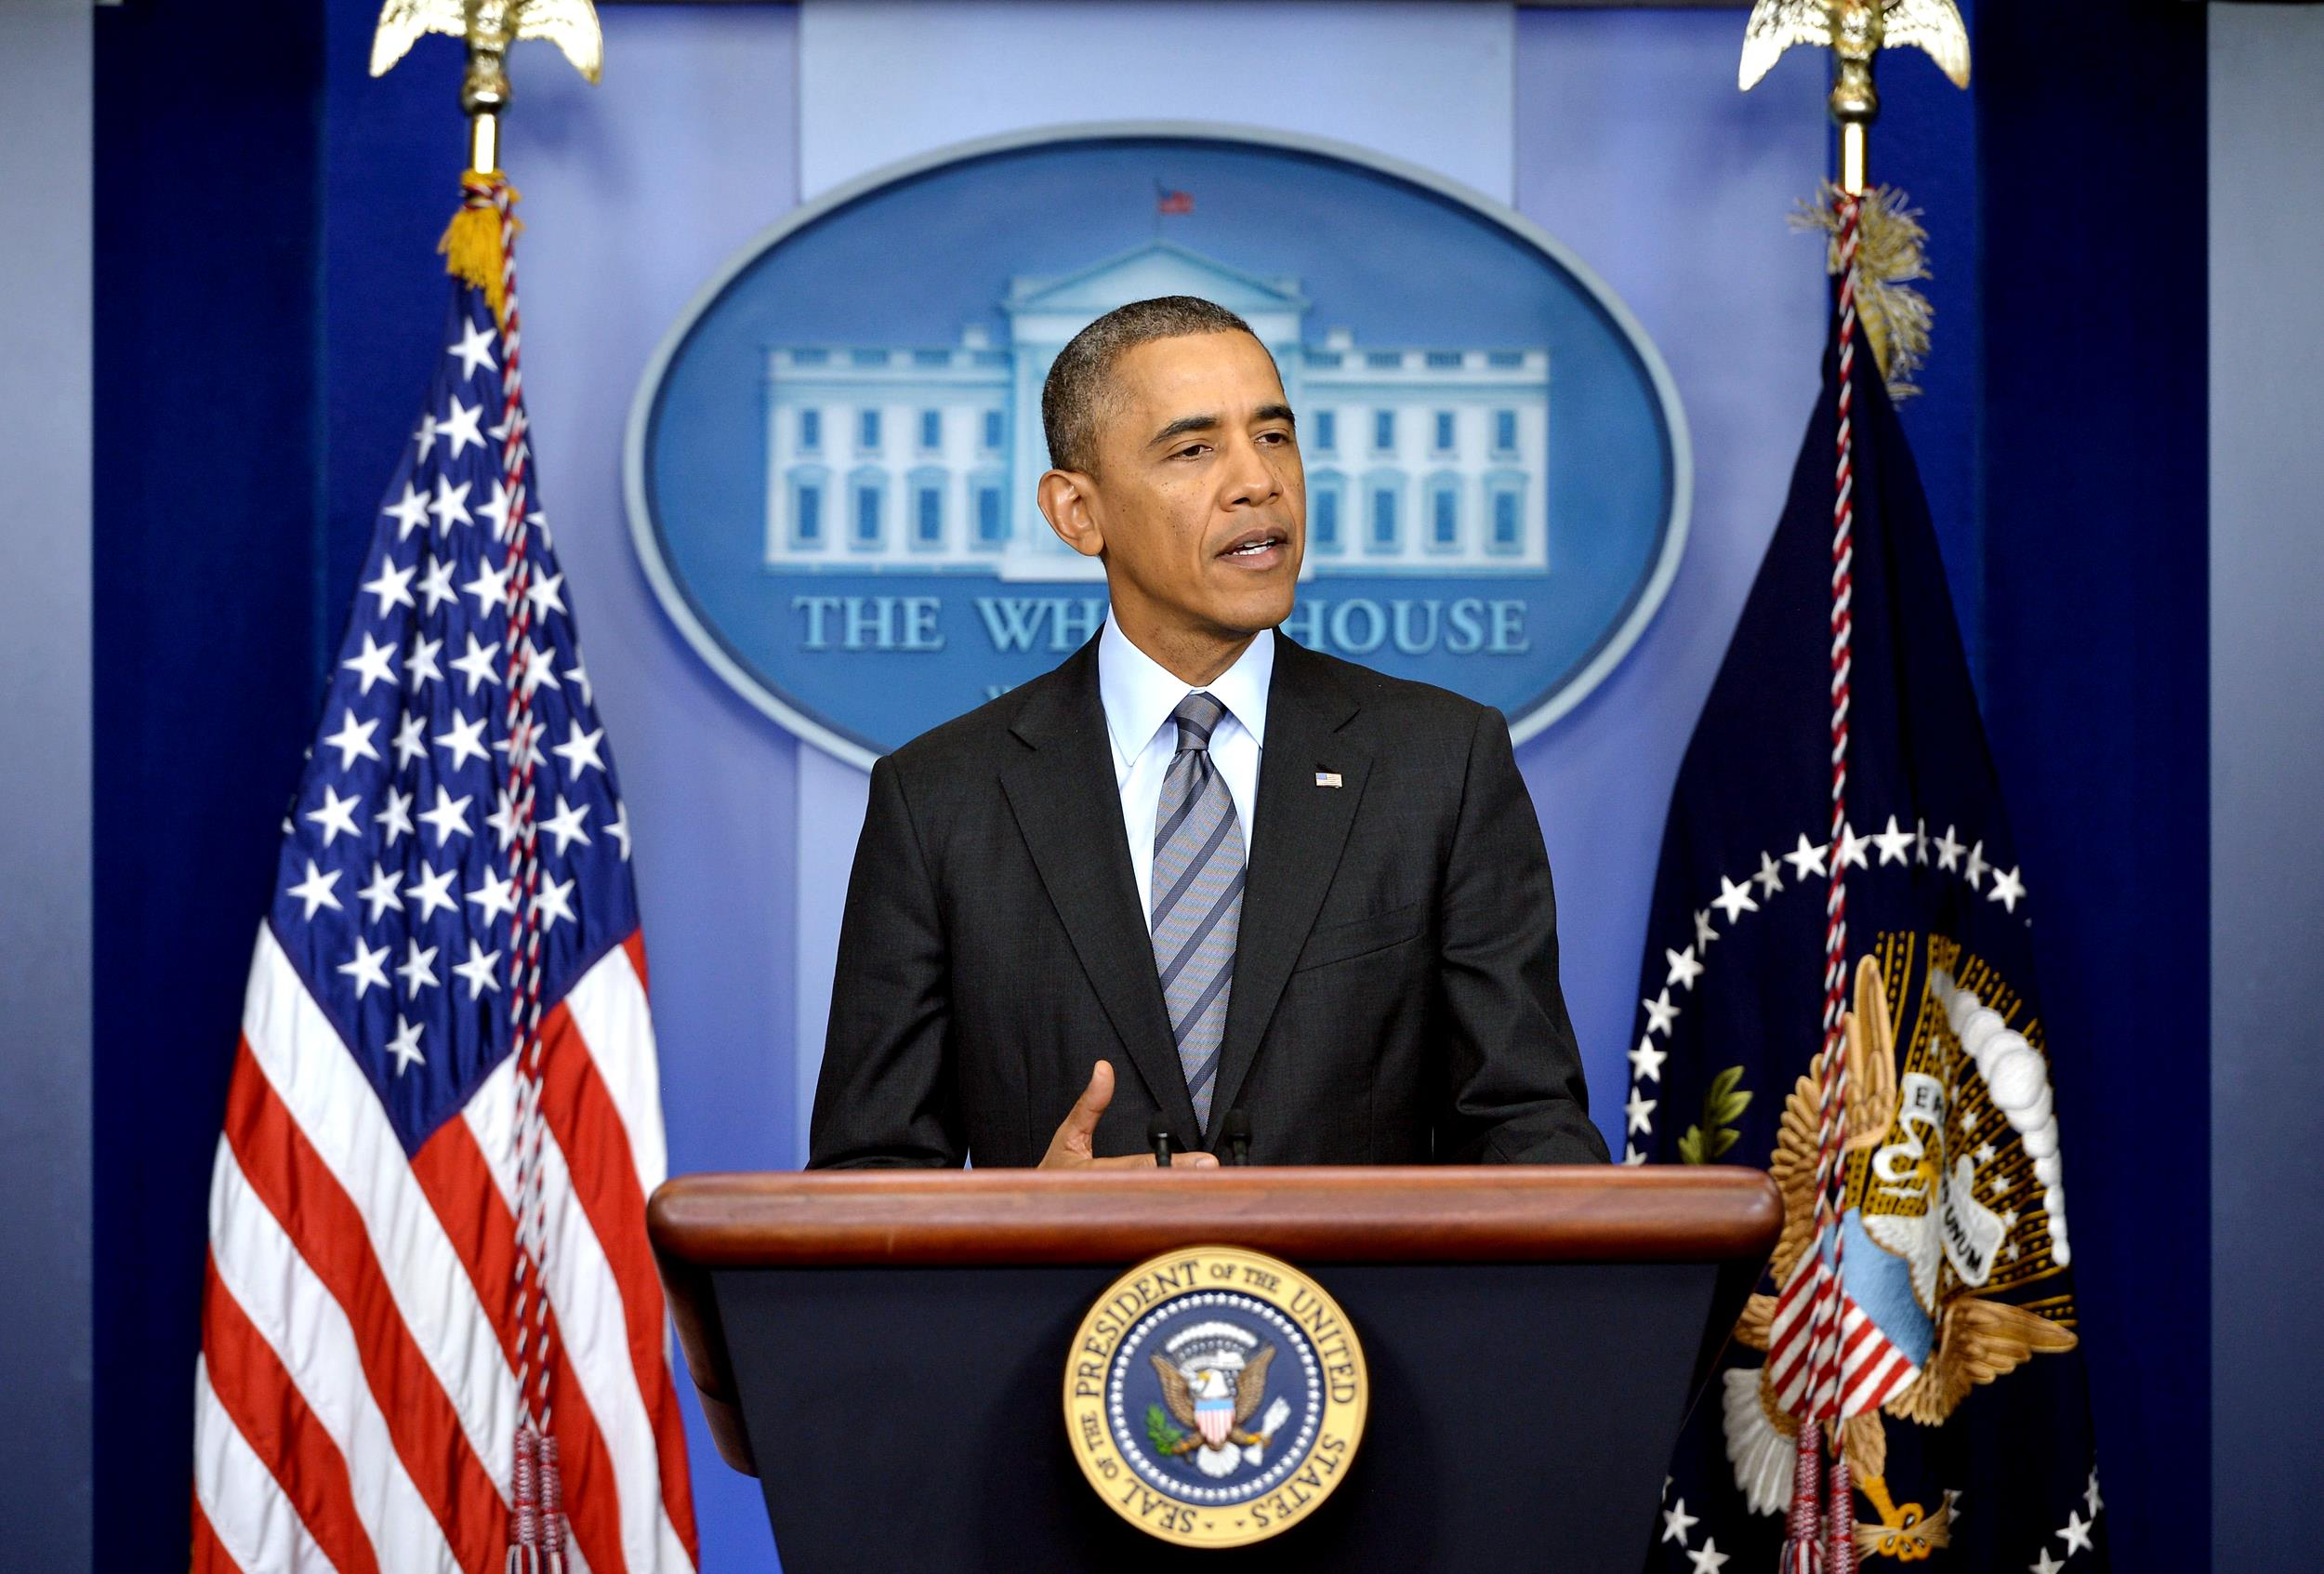 140306-obama-ukraine-briefing-jsw-124p_0c3a31d984edfa75eff6ee4b71292e98